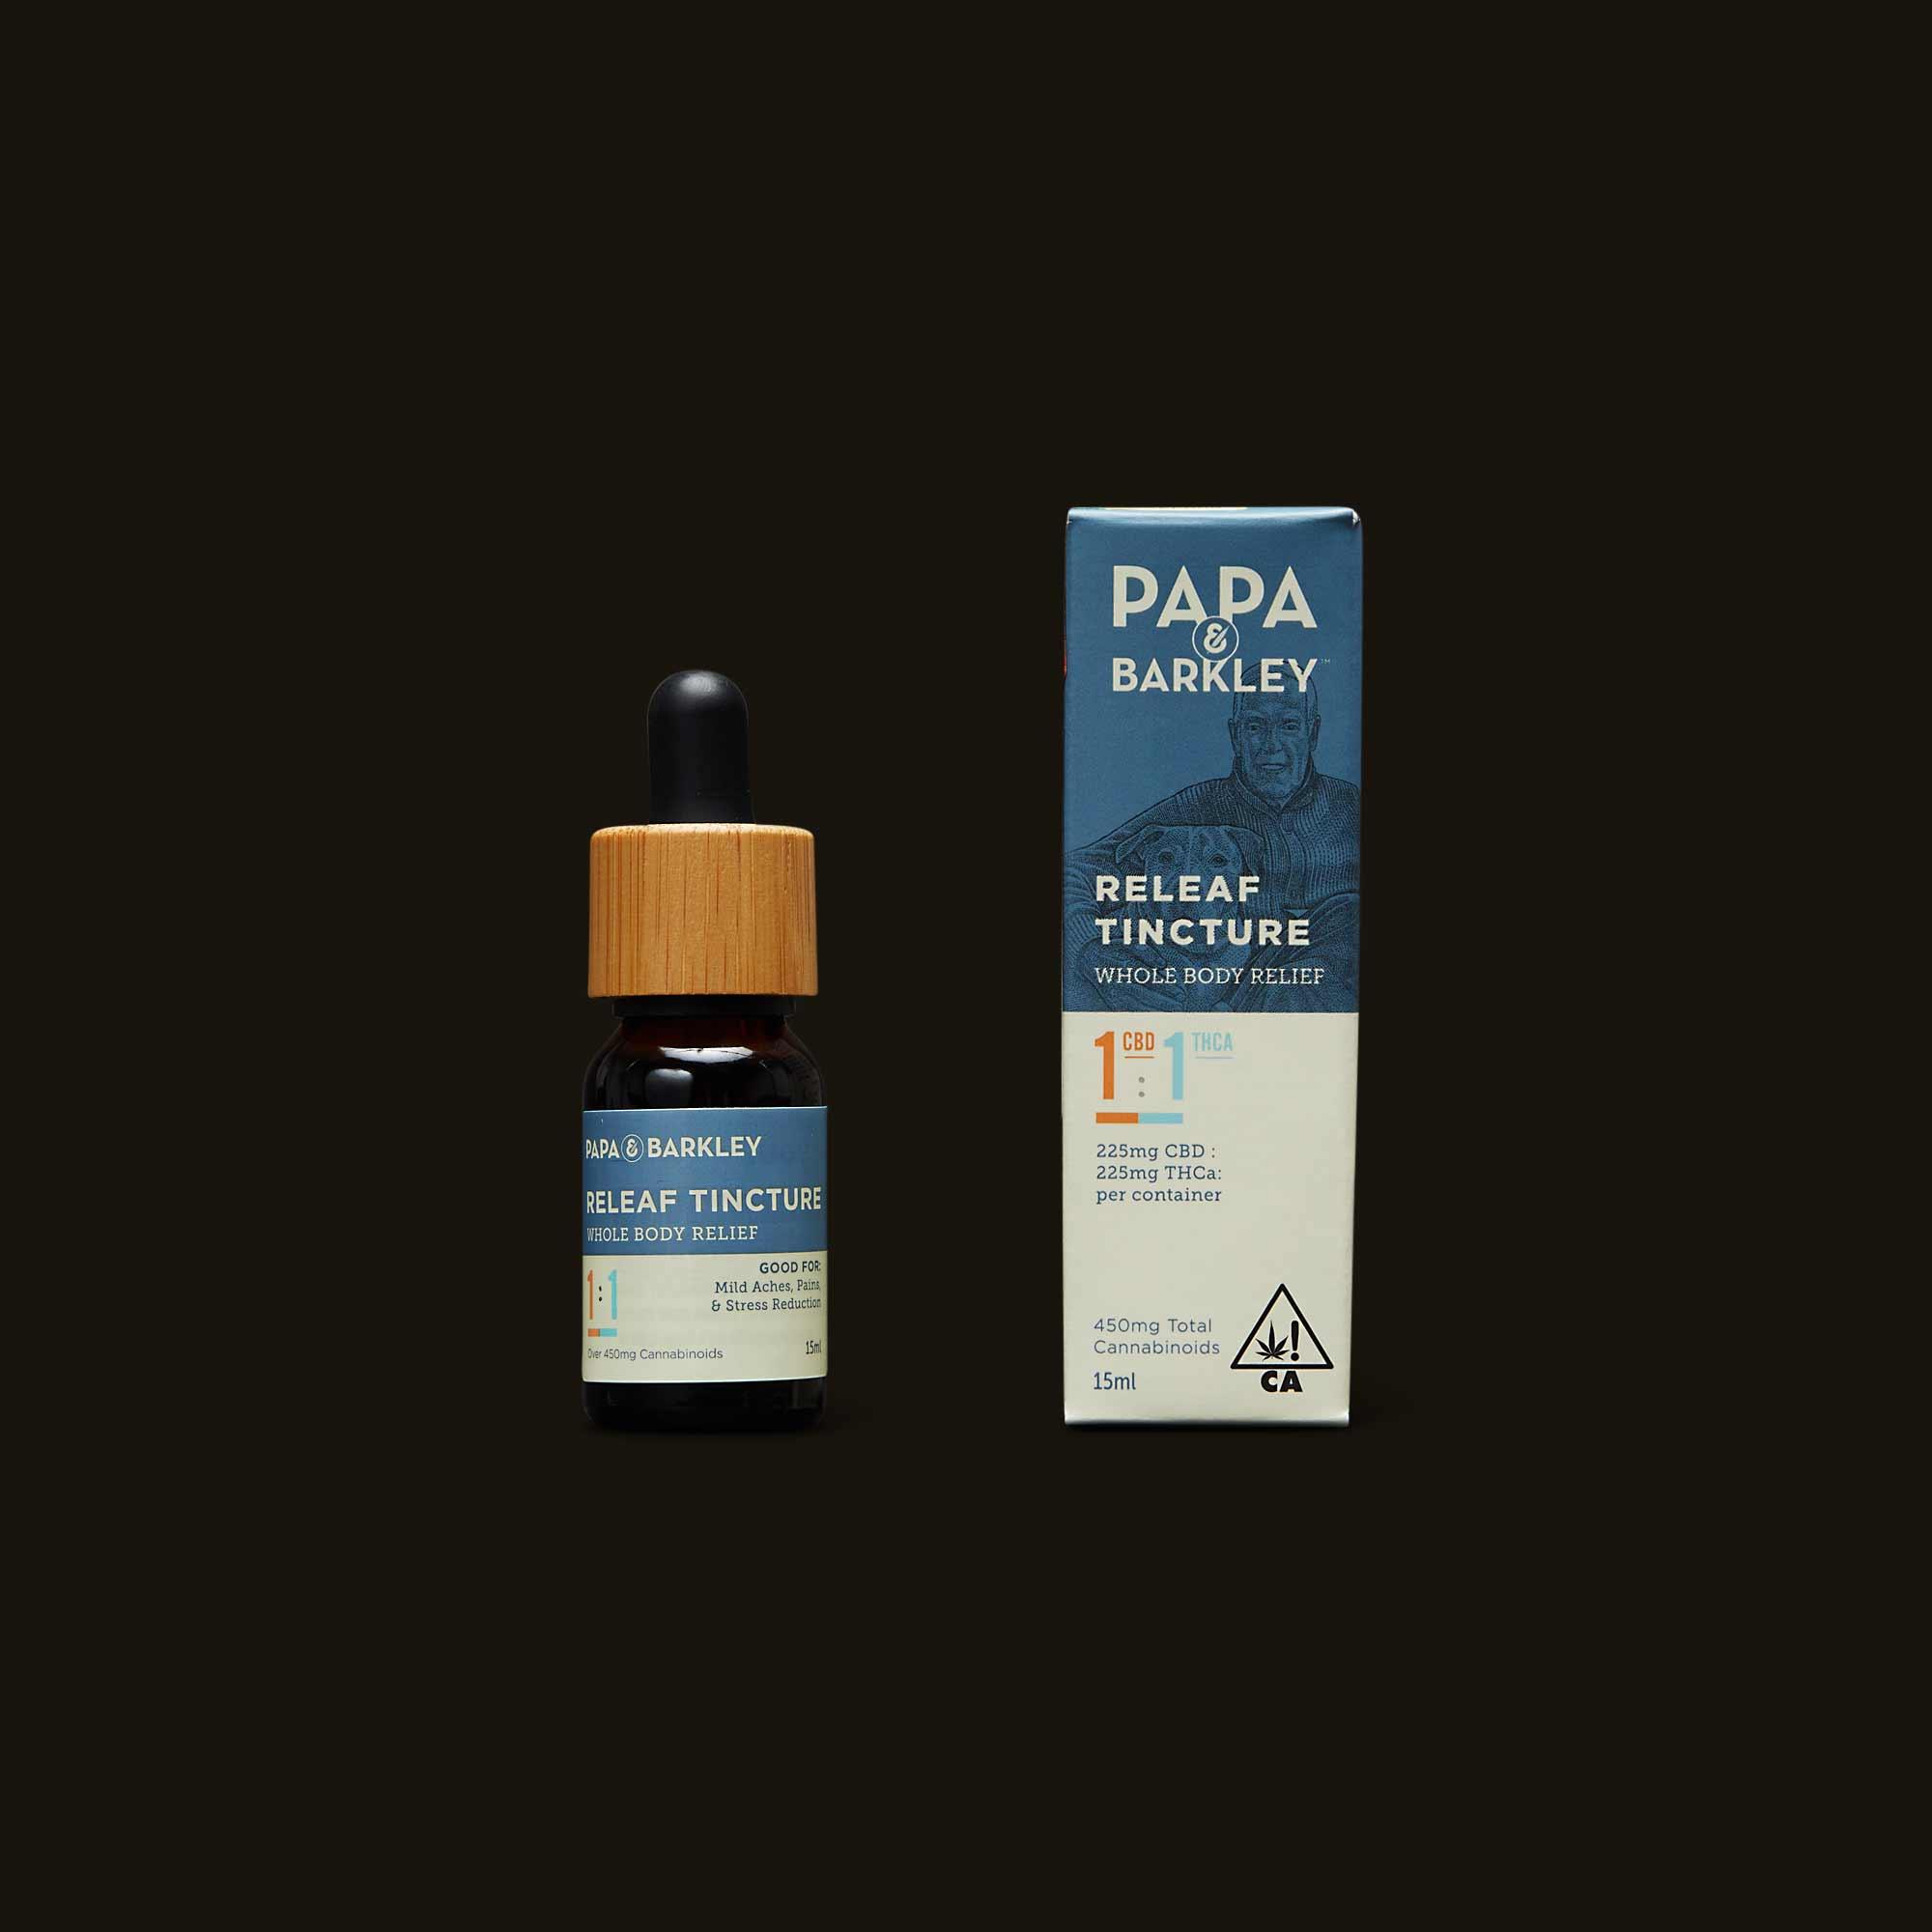 Papa & Barkley 1:1 CBD:THCa Releaf Tincture